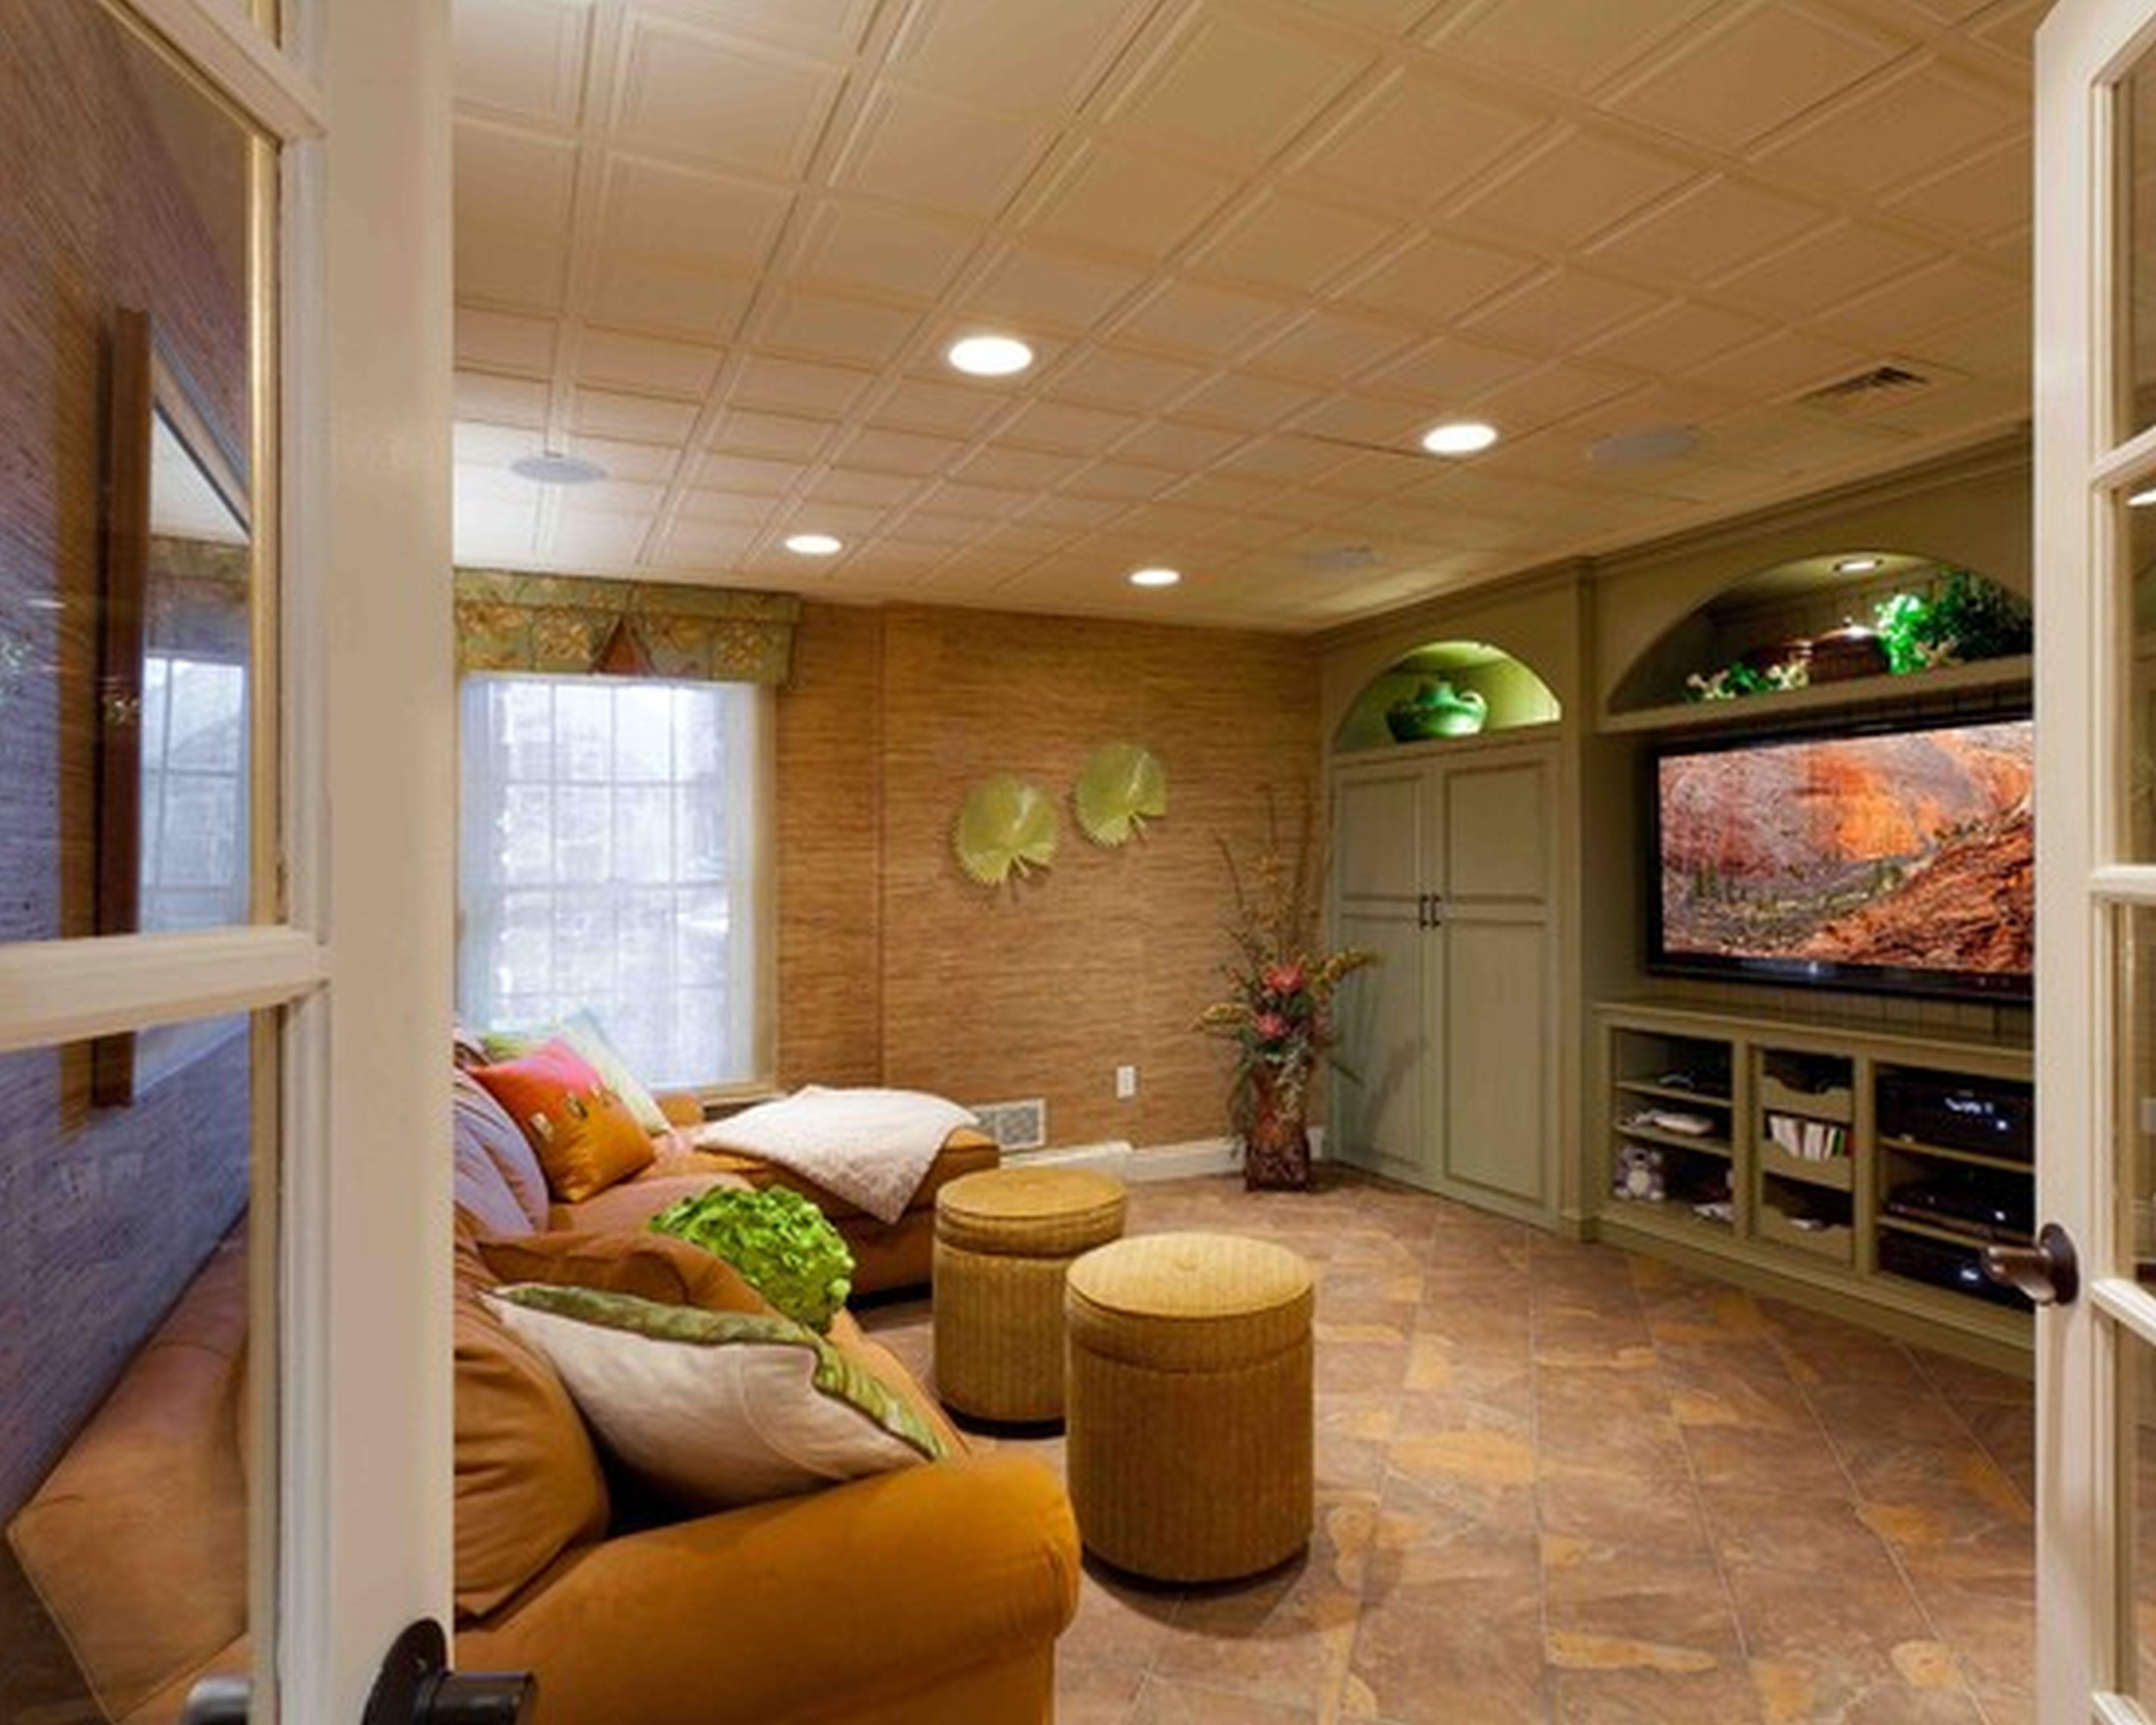 Basement Lighting Design Exterior apartments exciting tropical basement drop ceiling track lighting